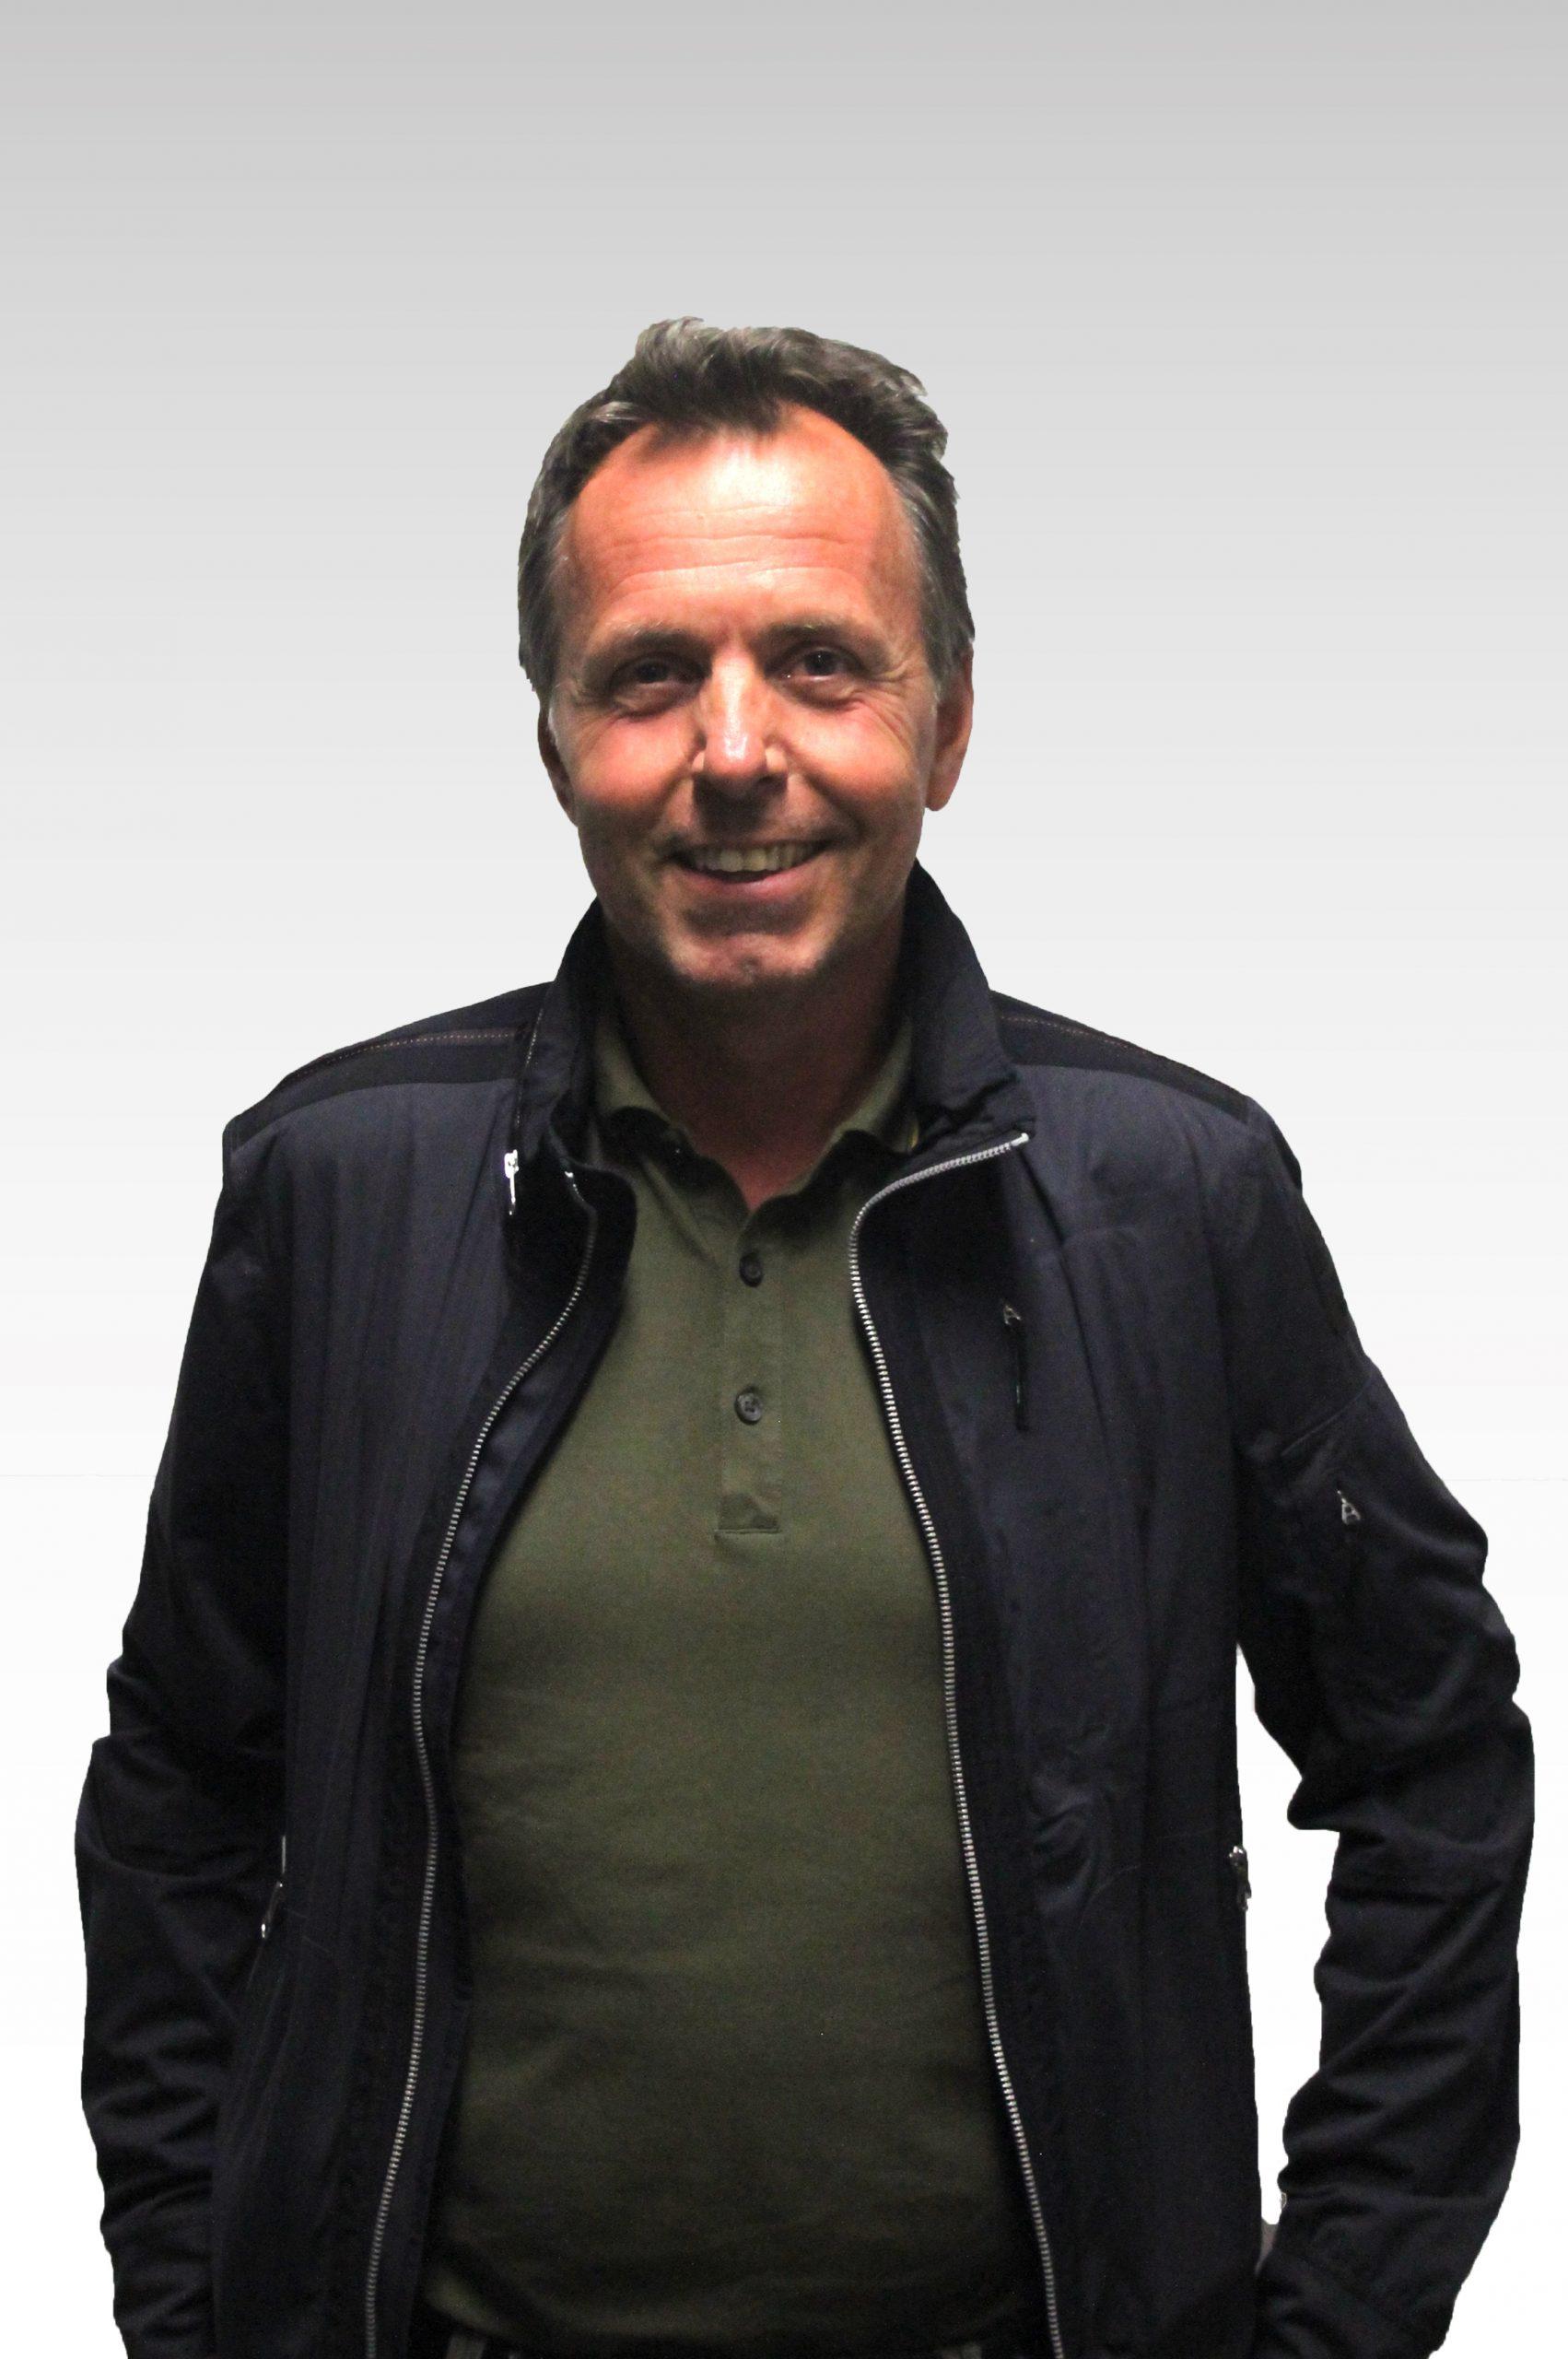 Guillaume Targe